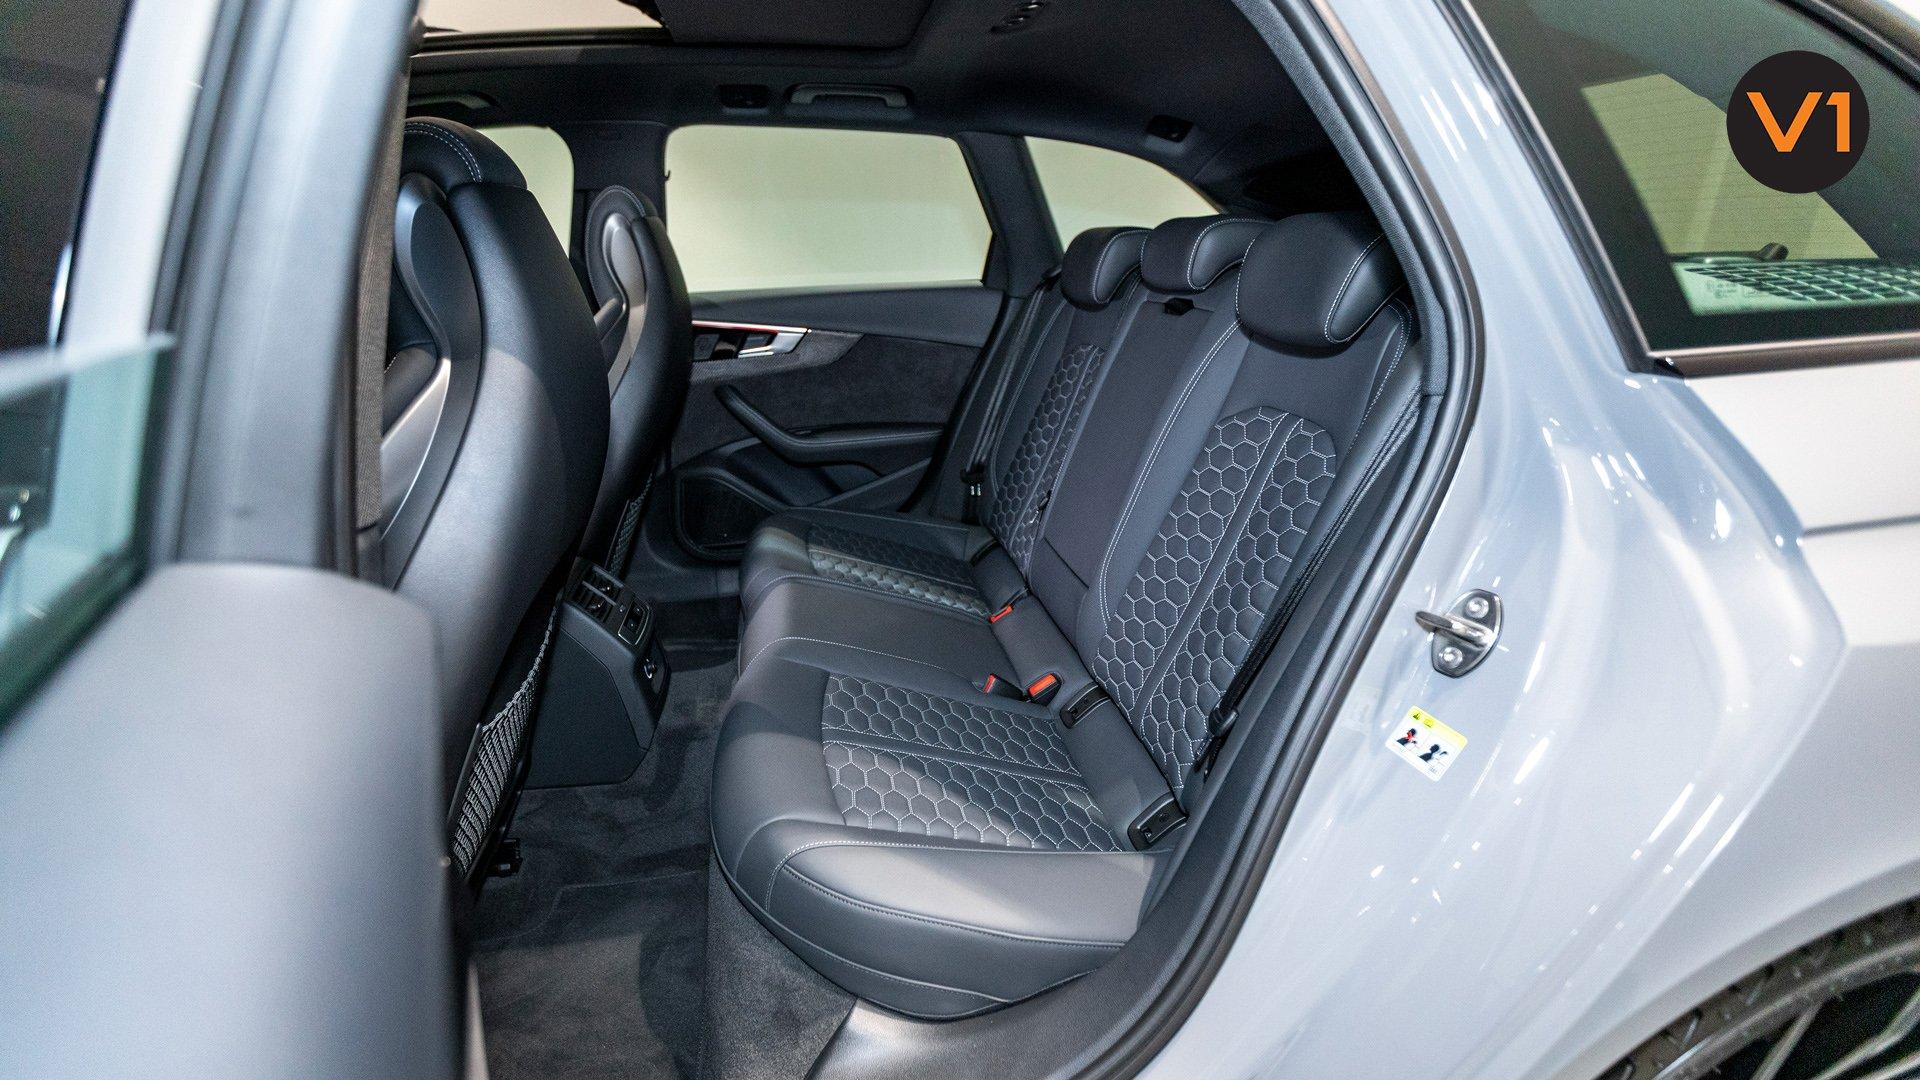 AUDI RS 4 AVANT - Rear Passenger Area 2